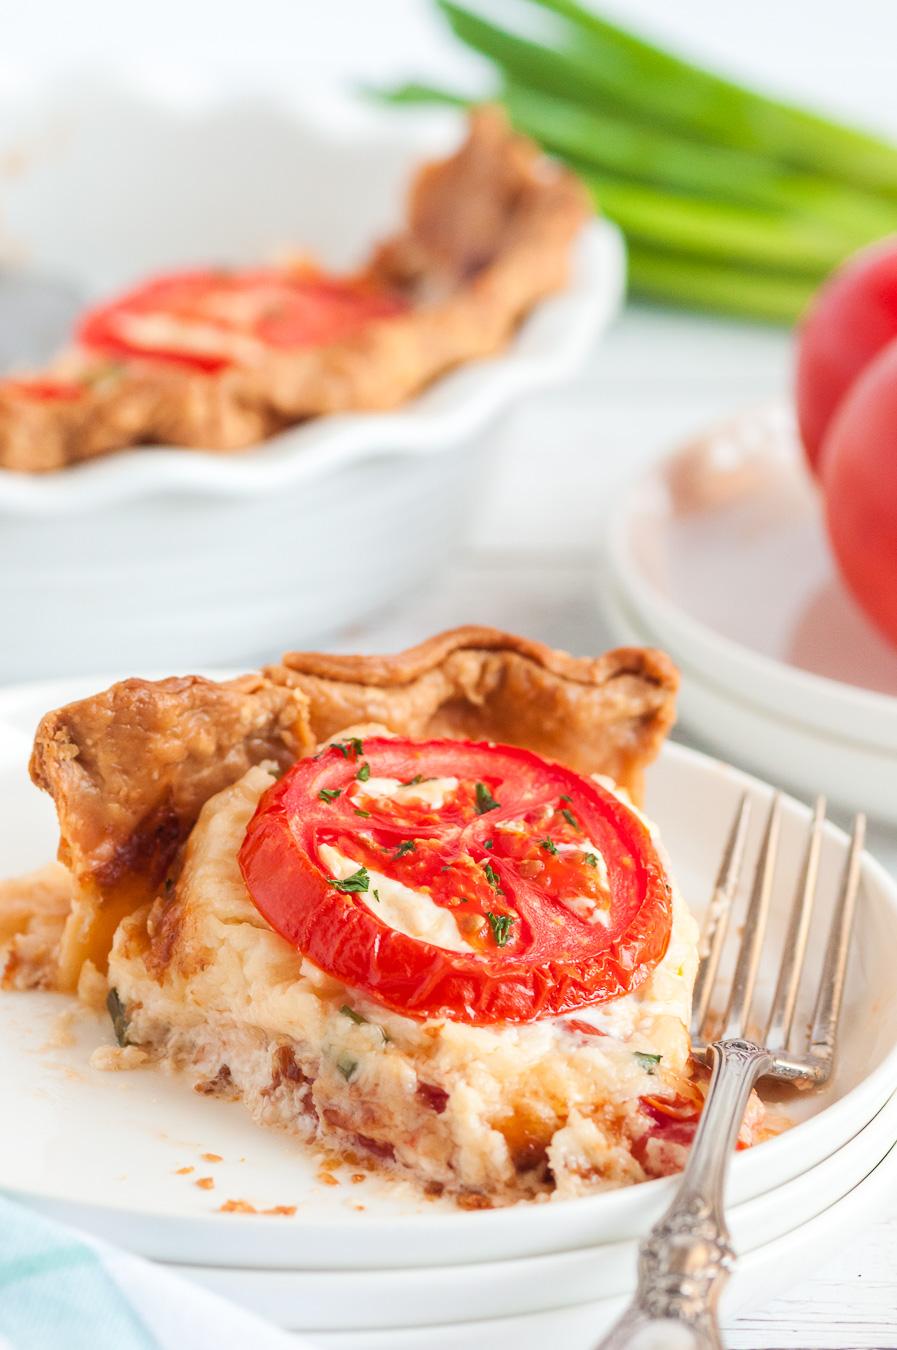 slice of tomato pie on a dish